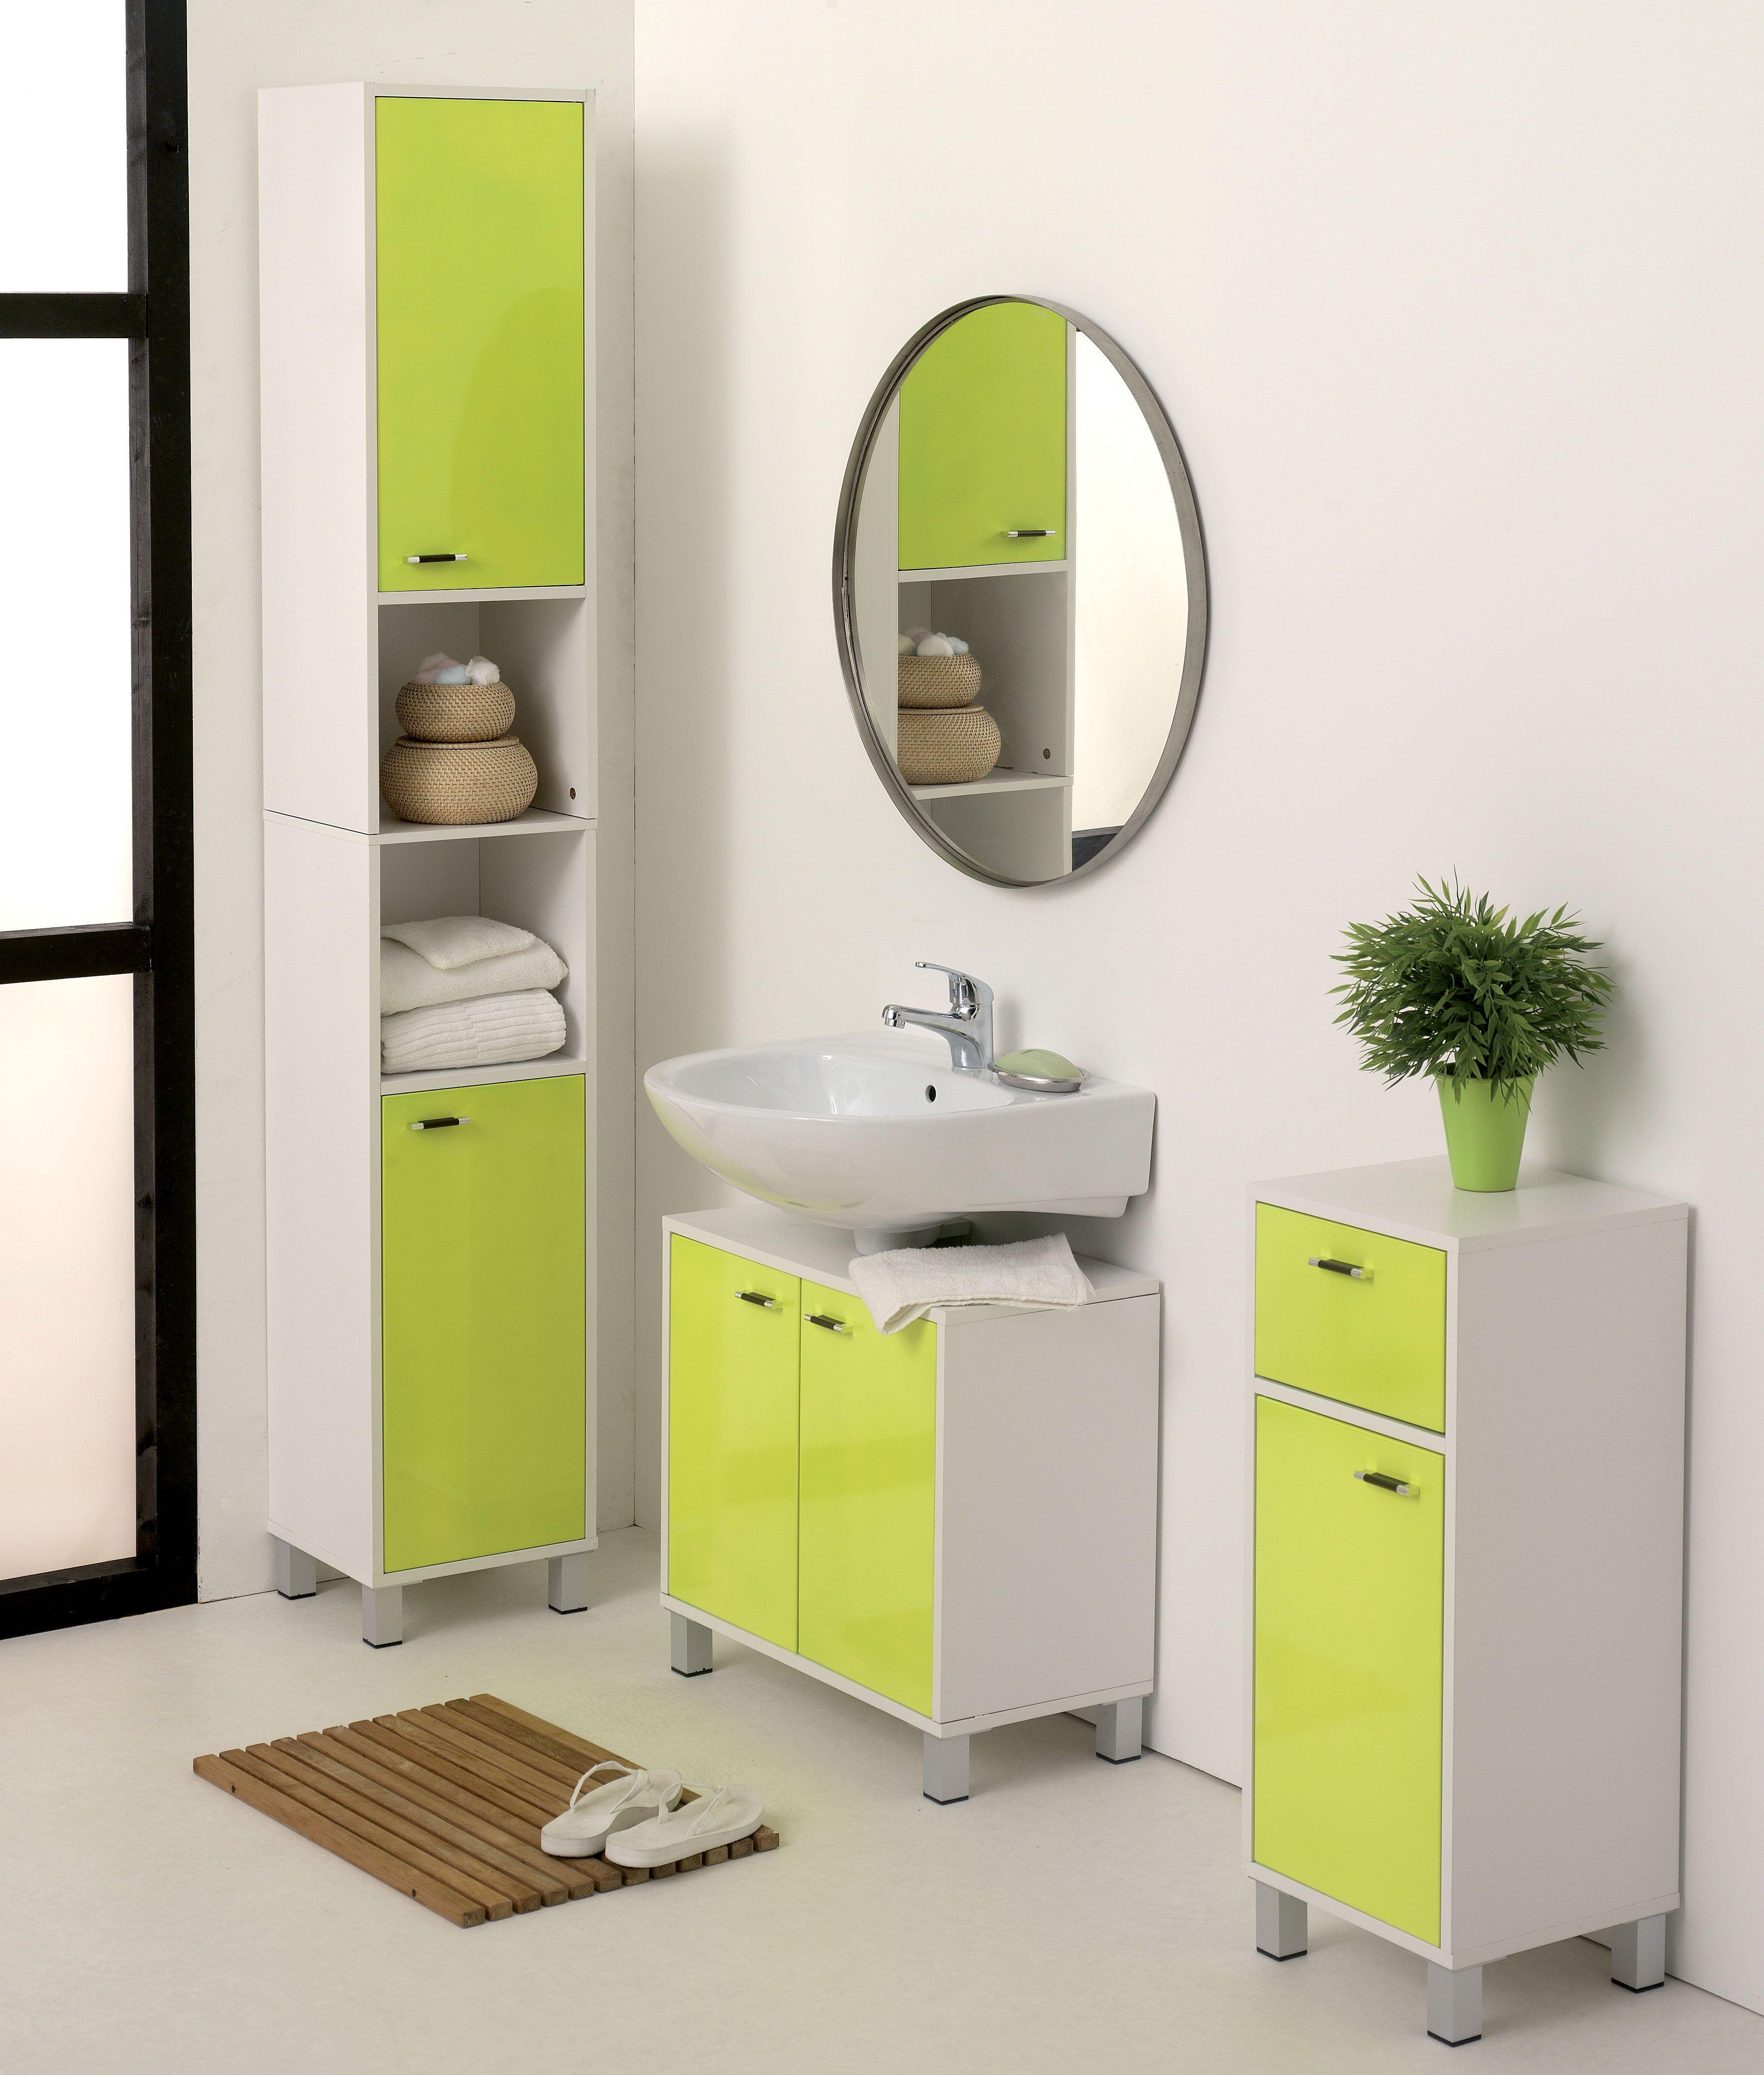 salle de bain verte et blanche zen et pratique centrakor. Black Bedroom Furniture Sets. Home Design Ideas